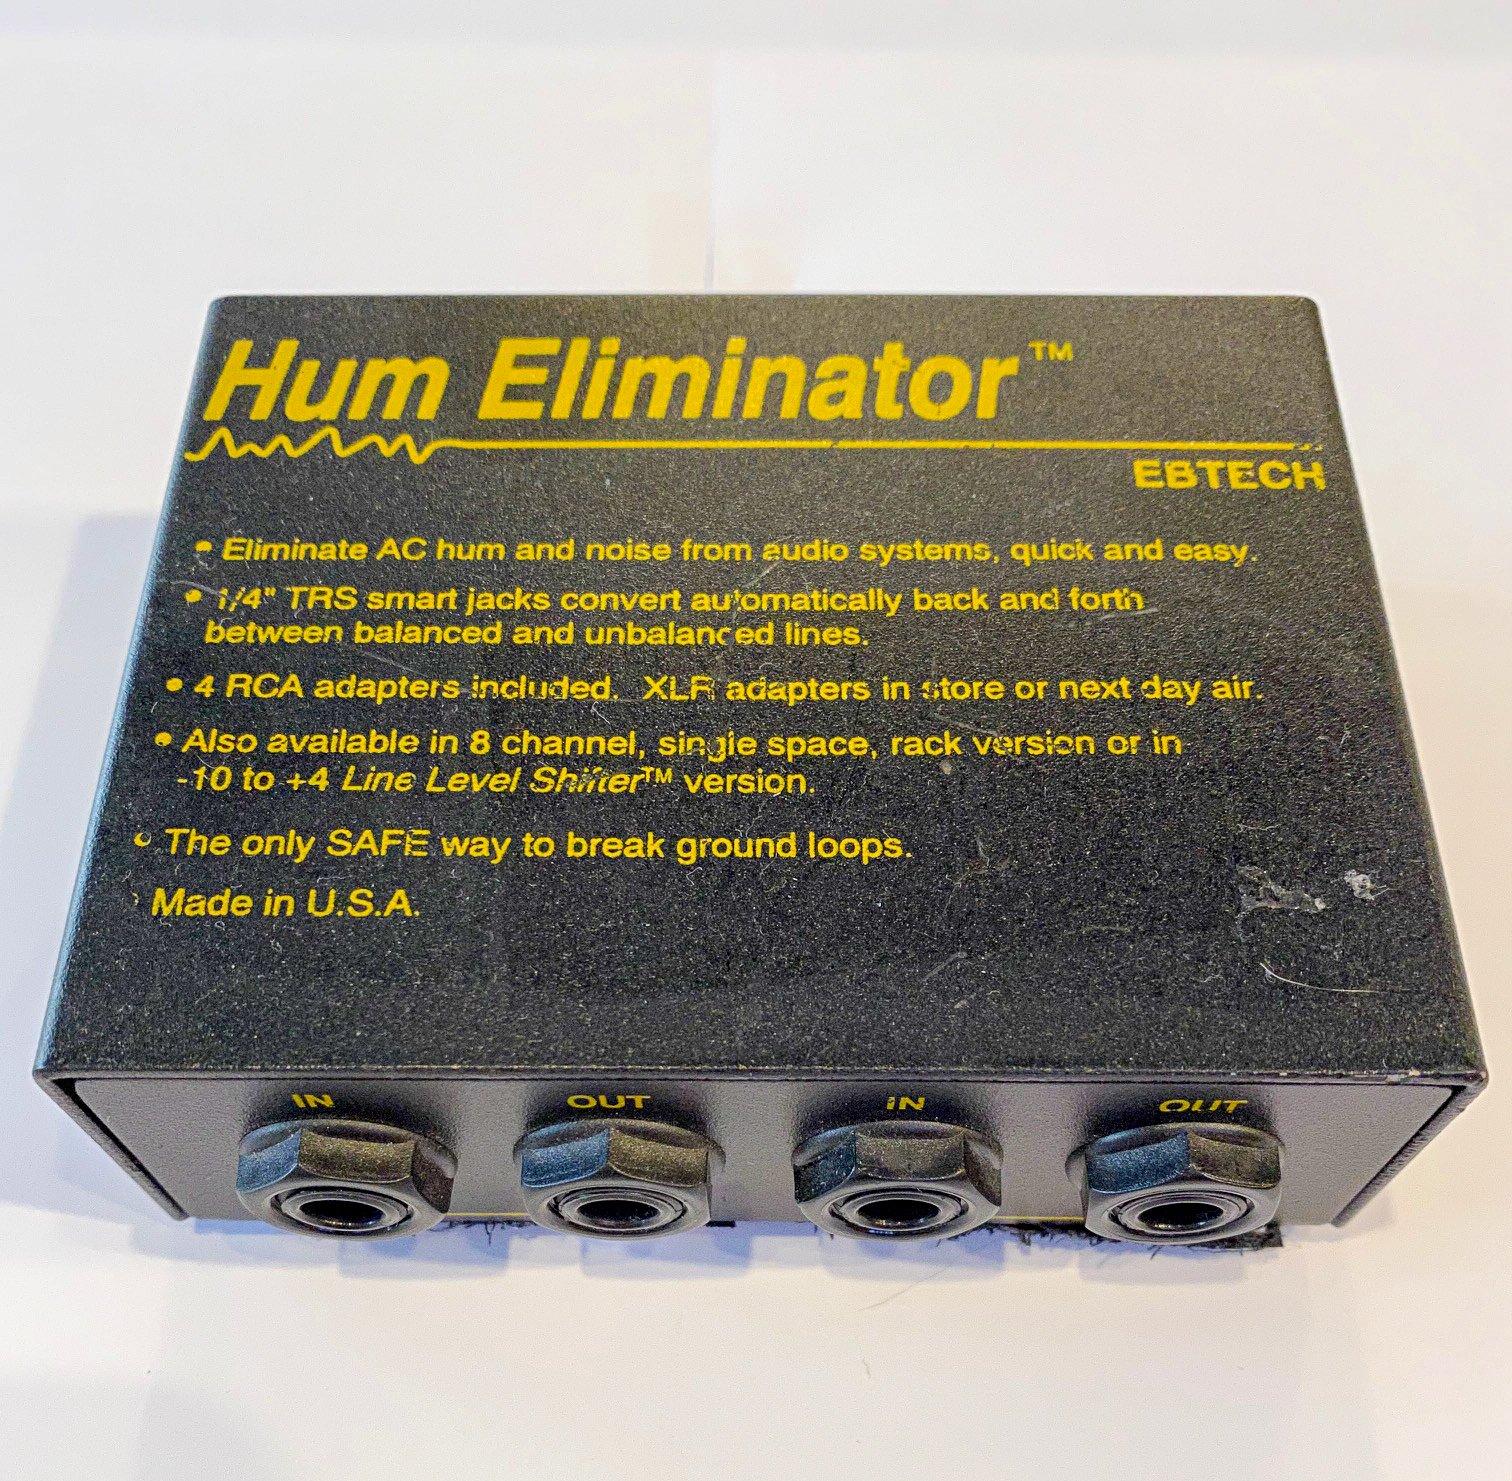 EBTECH Hum Eliminator